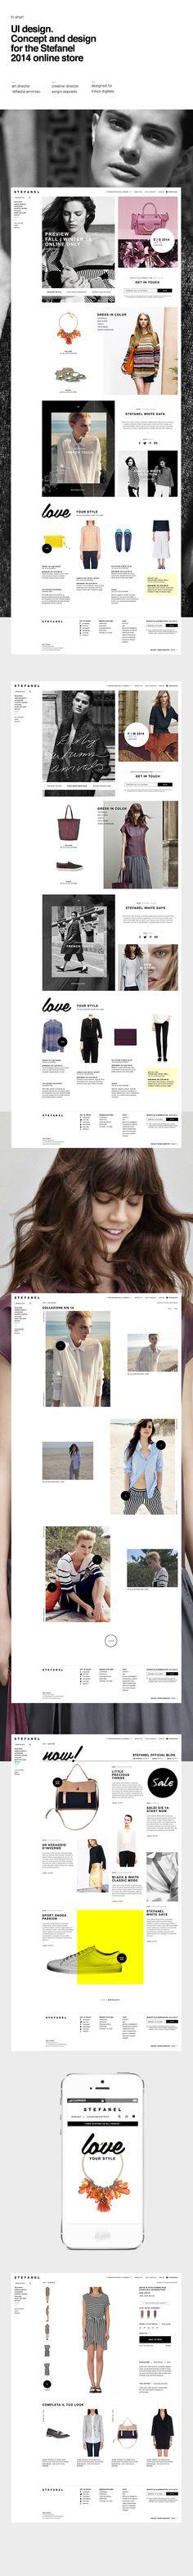 Stefanel 2014 online store on Behance